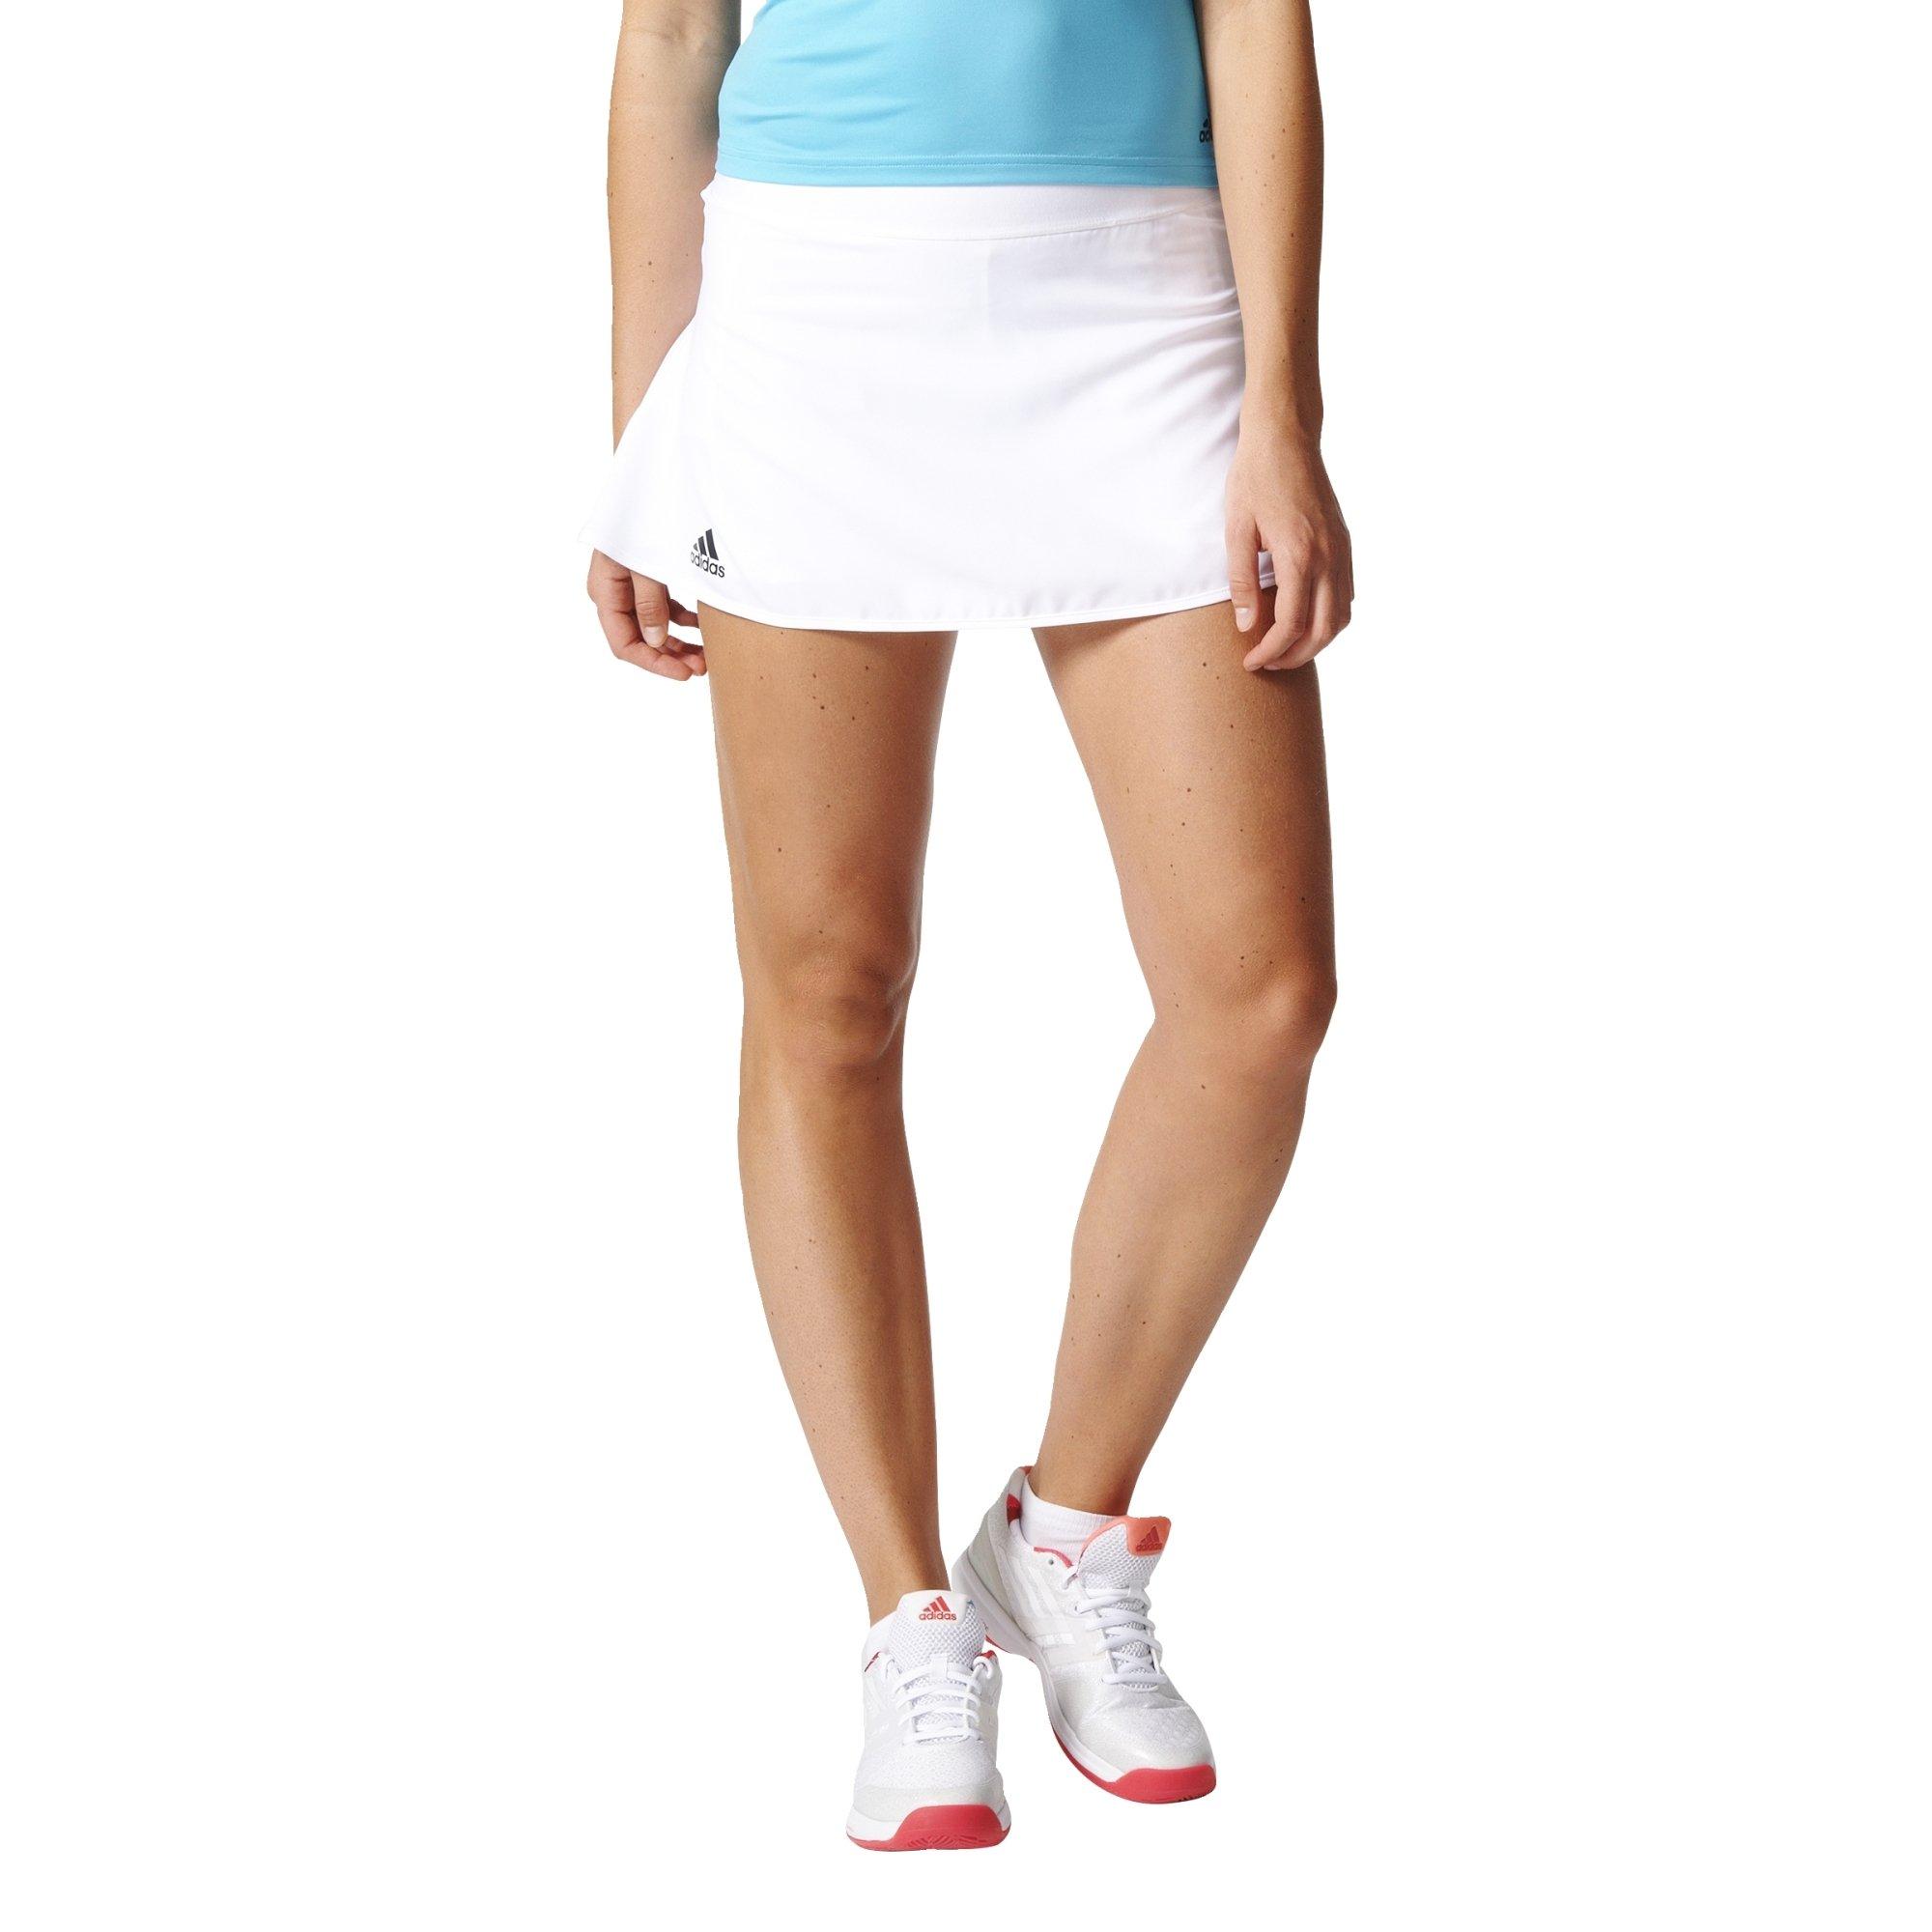 adidas Women's Tennis Club Skirt, White, Medium